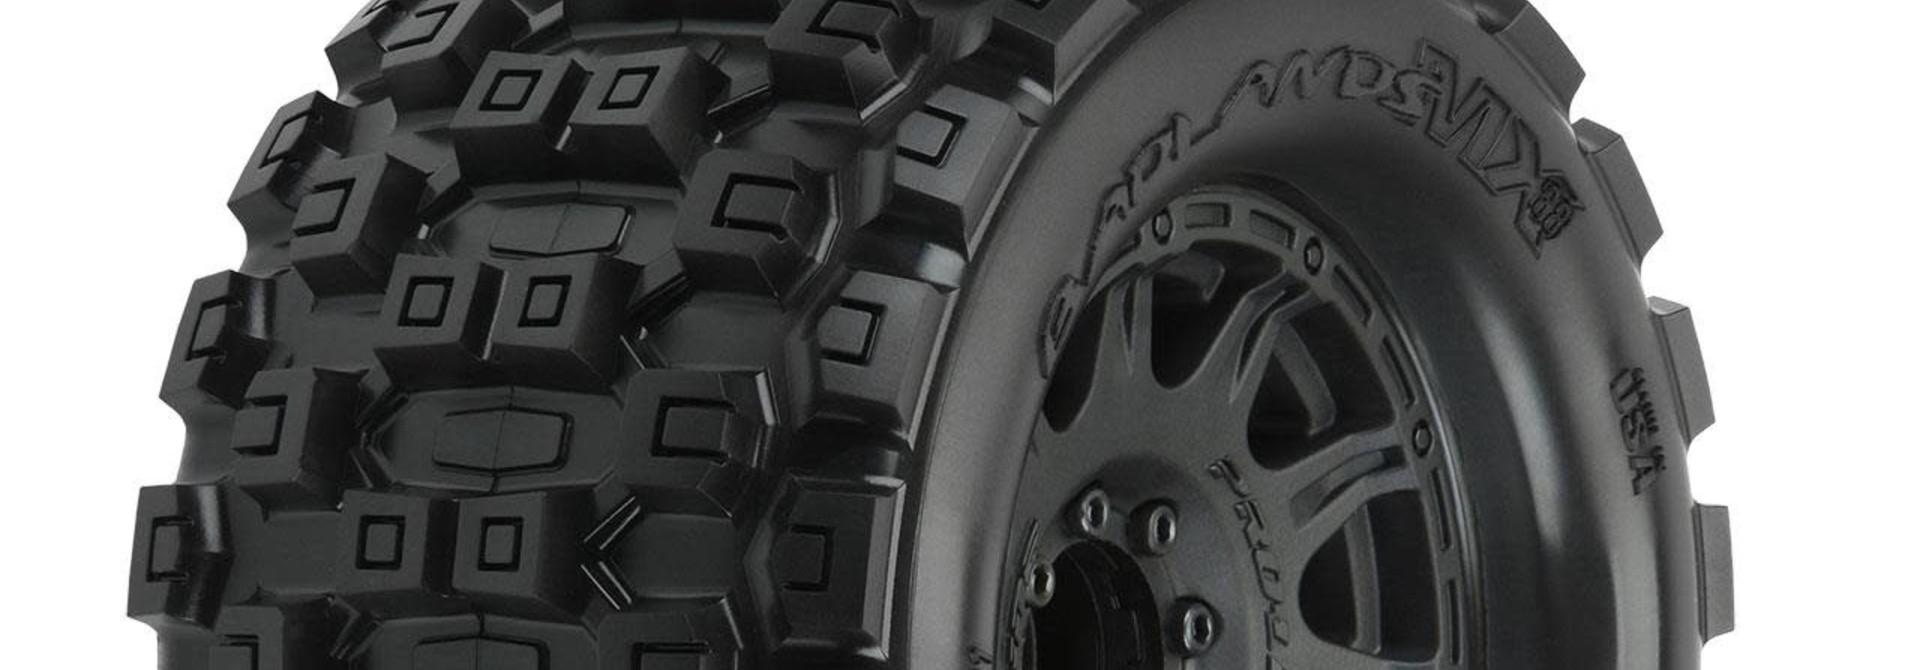 "Badlands MX38 3.8"" MTD Raid 8x32 17mm MT F/R"